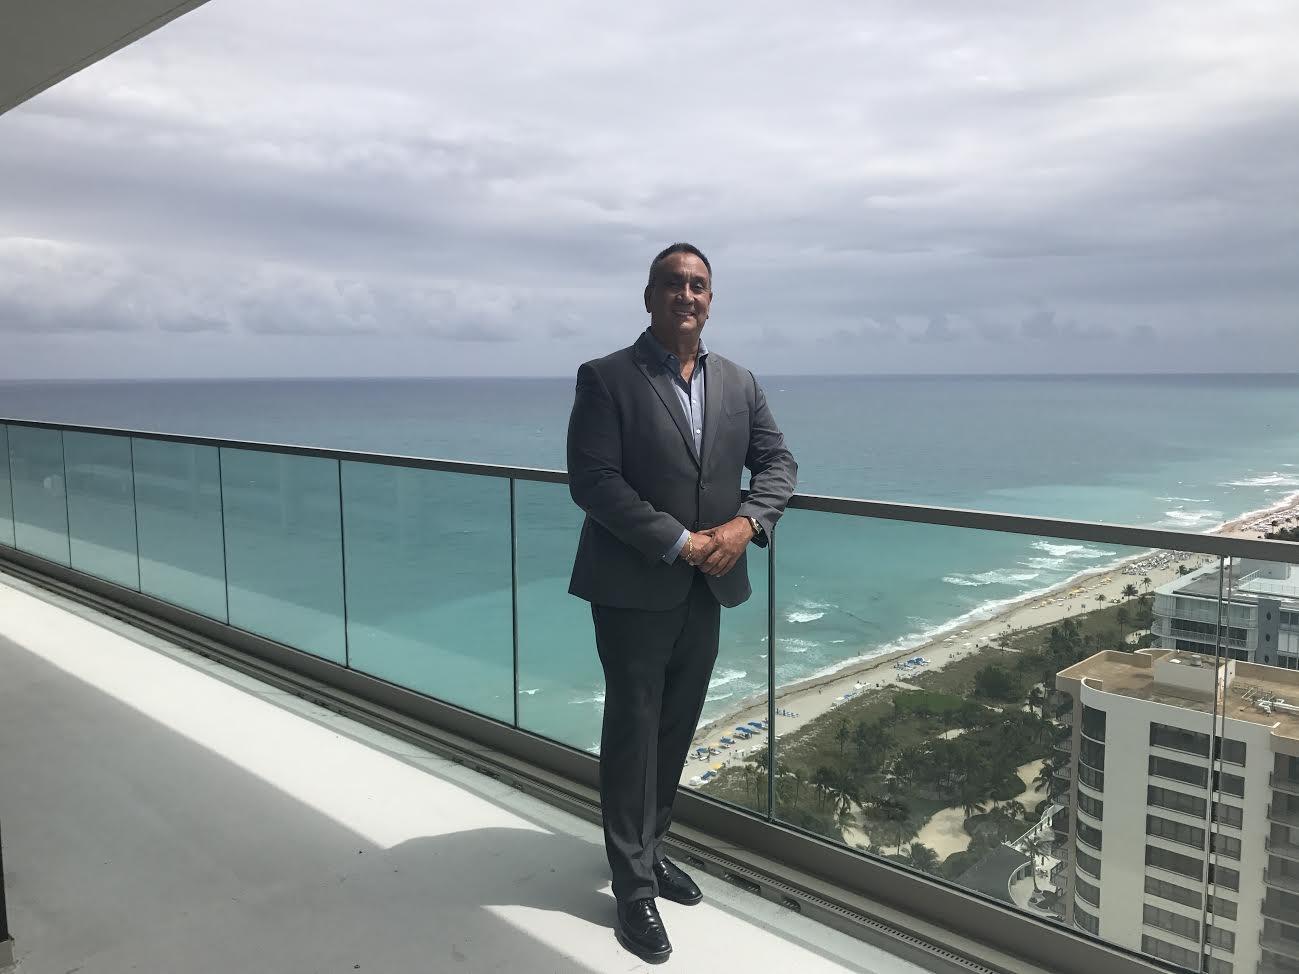 Raul Santidrian in the balcony of Oceana Bal Harbour Penthouse PH2701 S